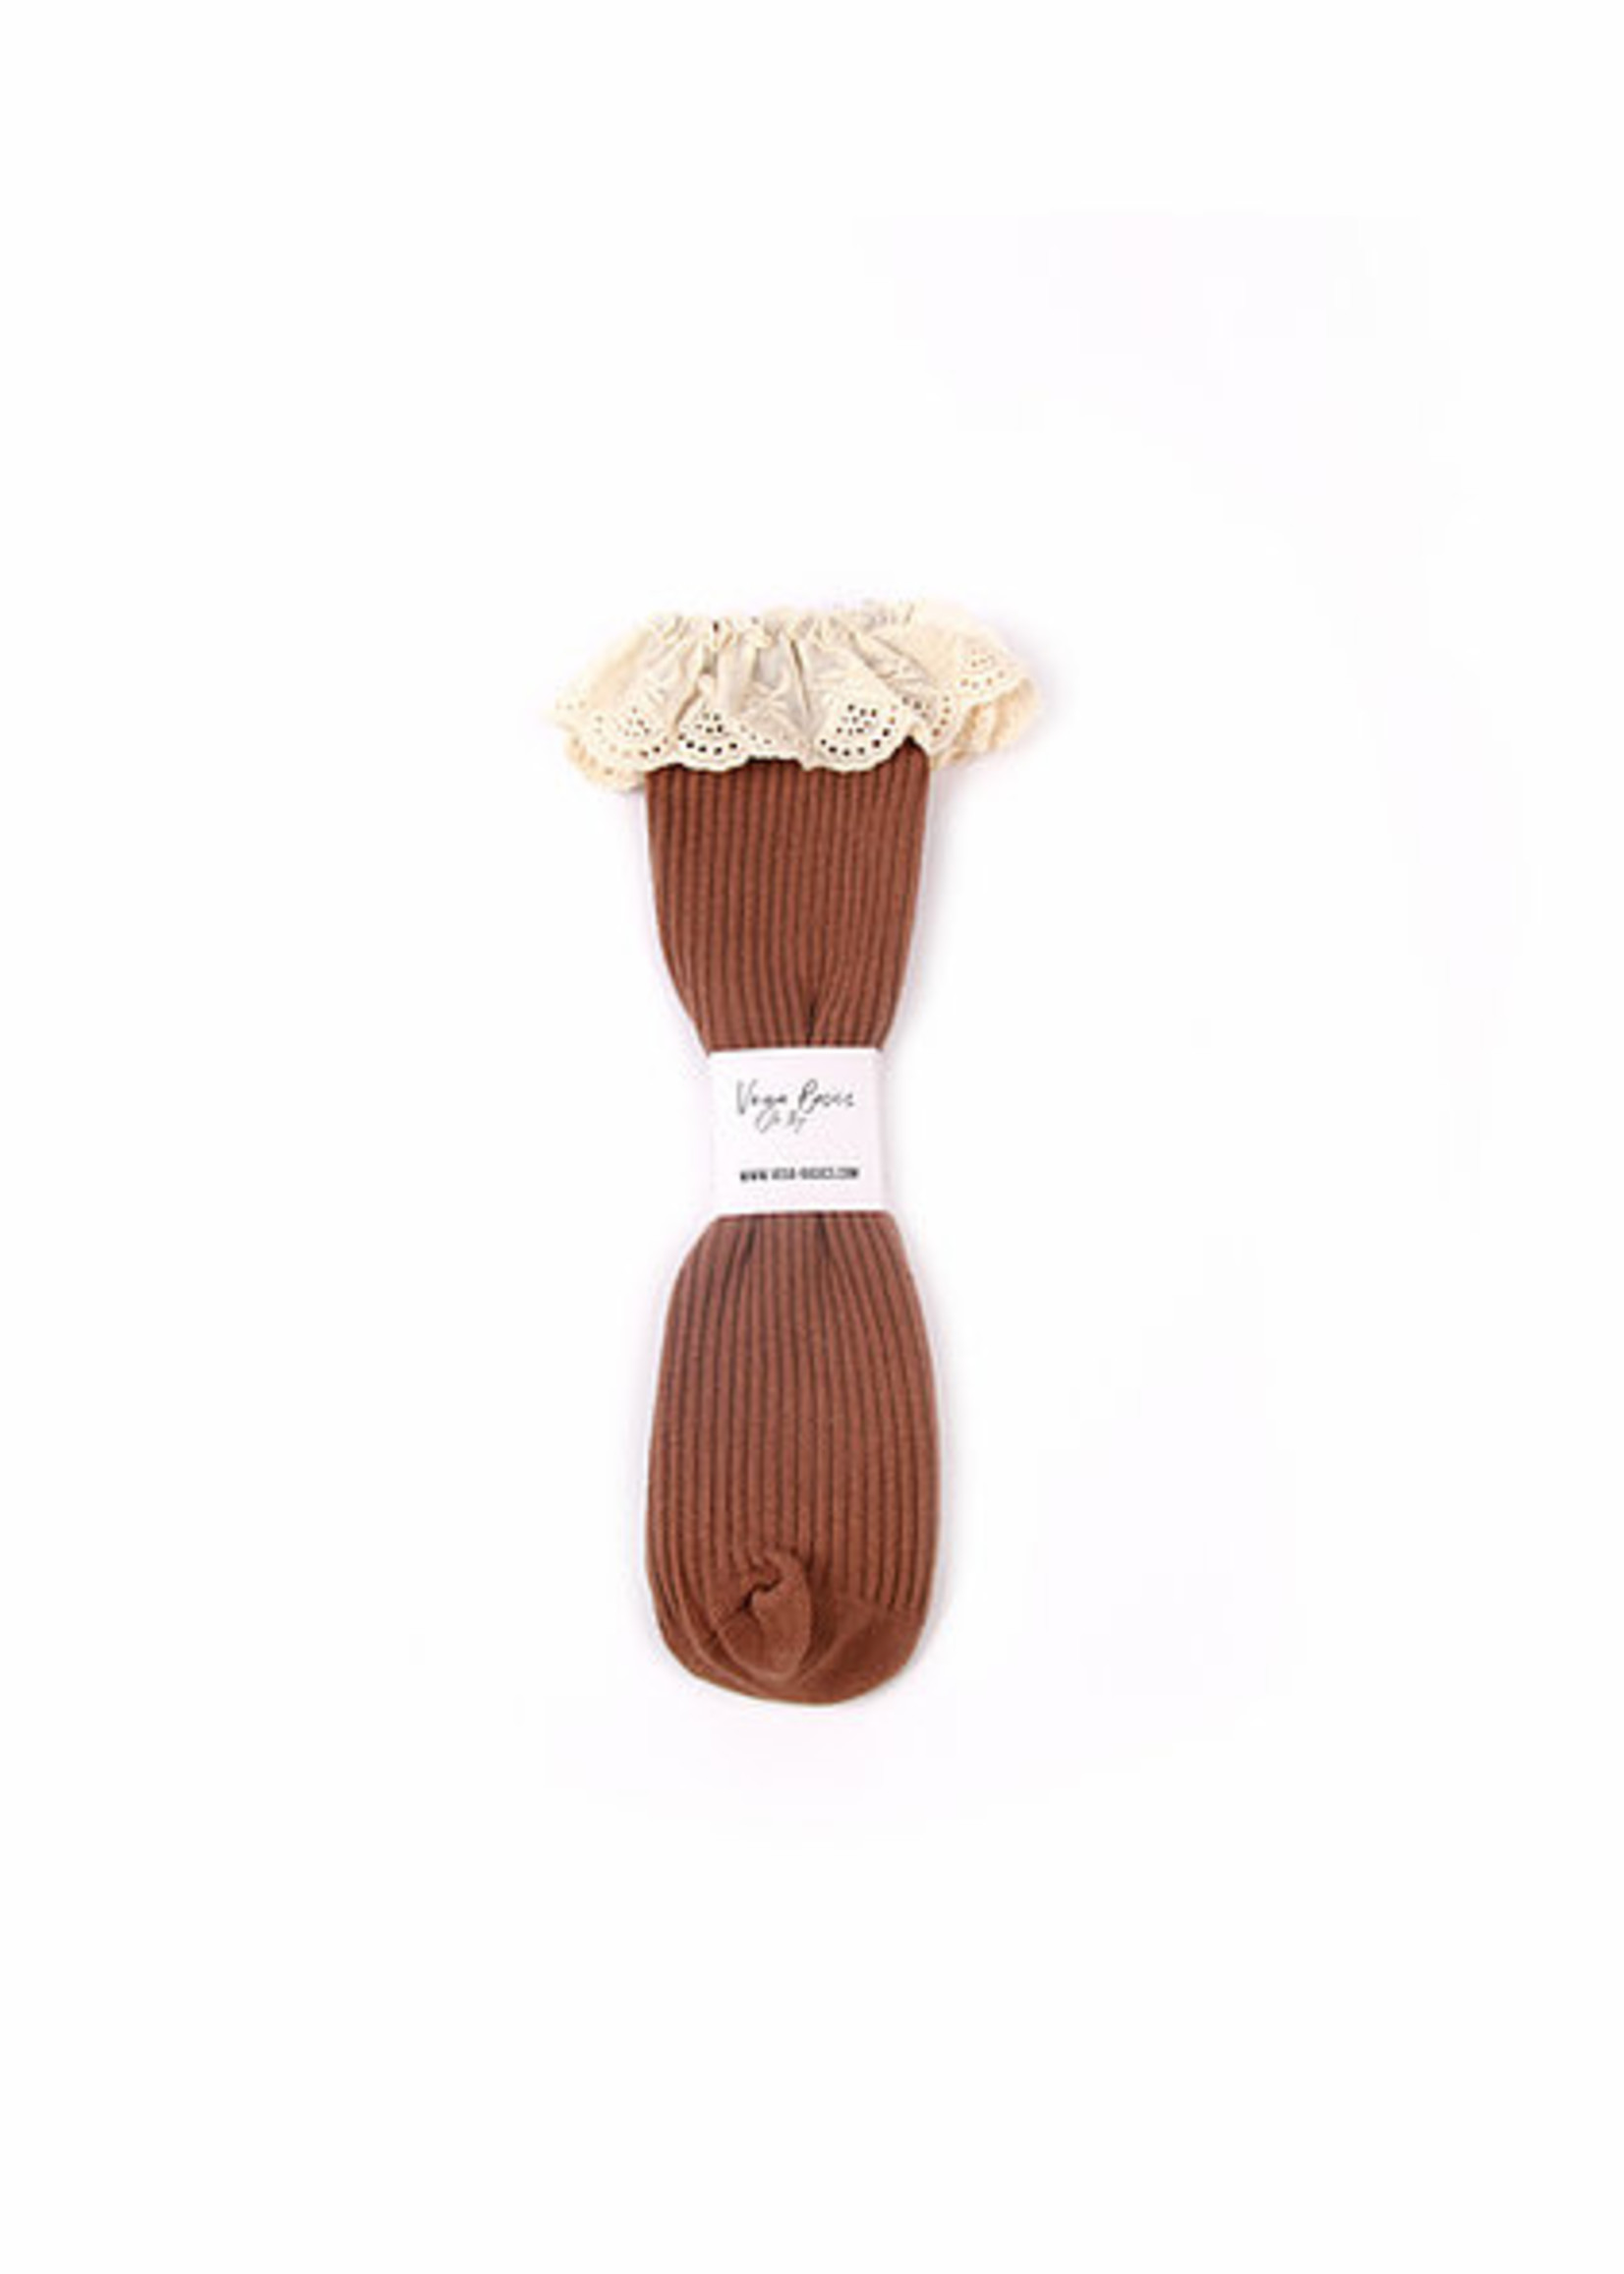 Vega Basics The Emilia Socks - Chocolate